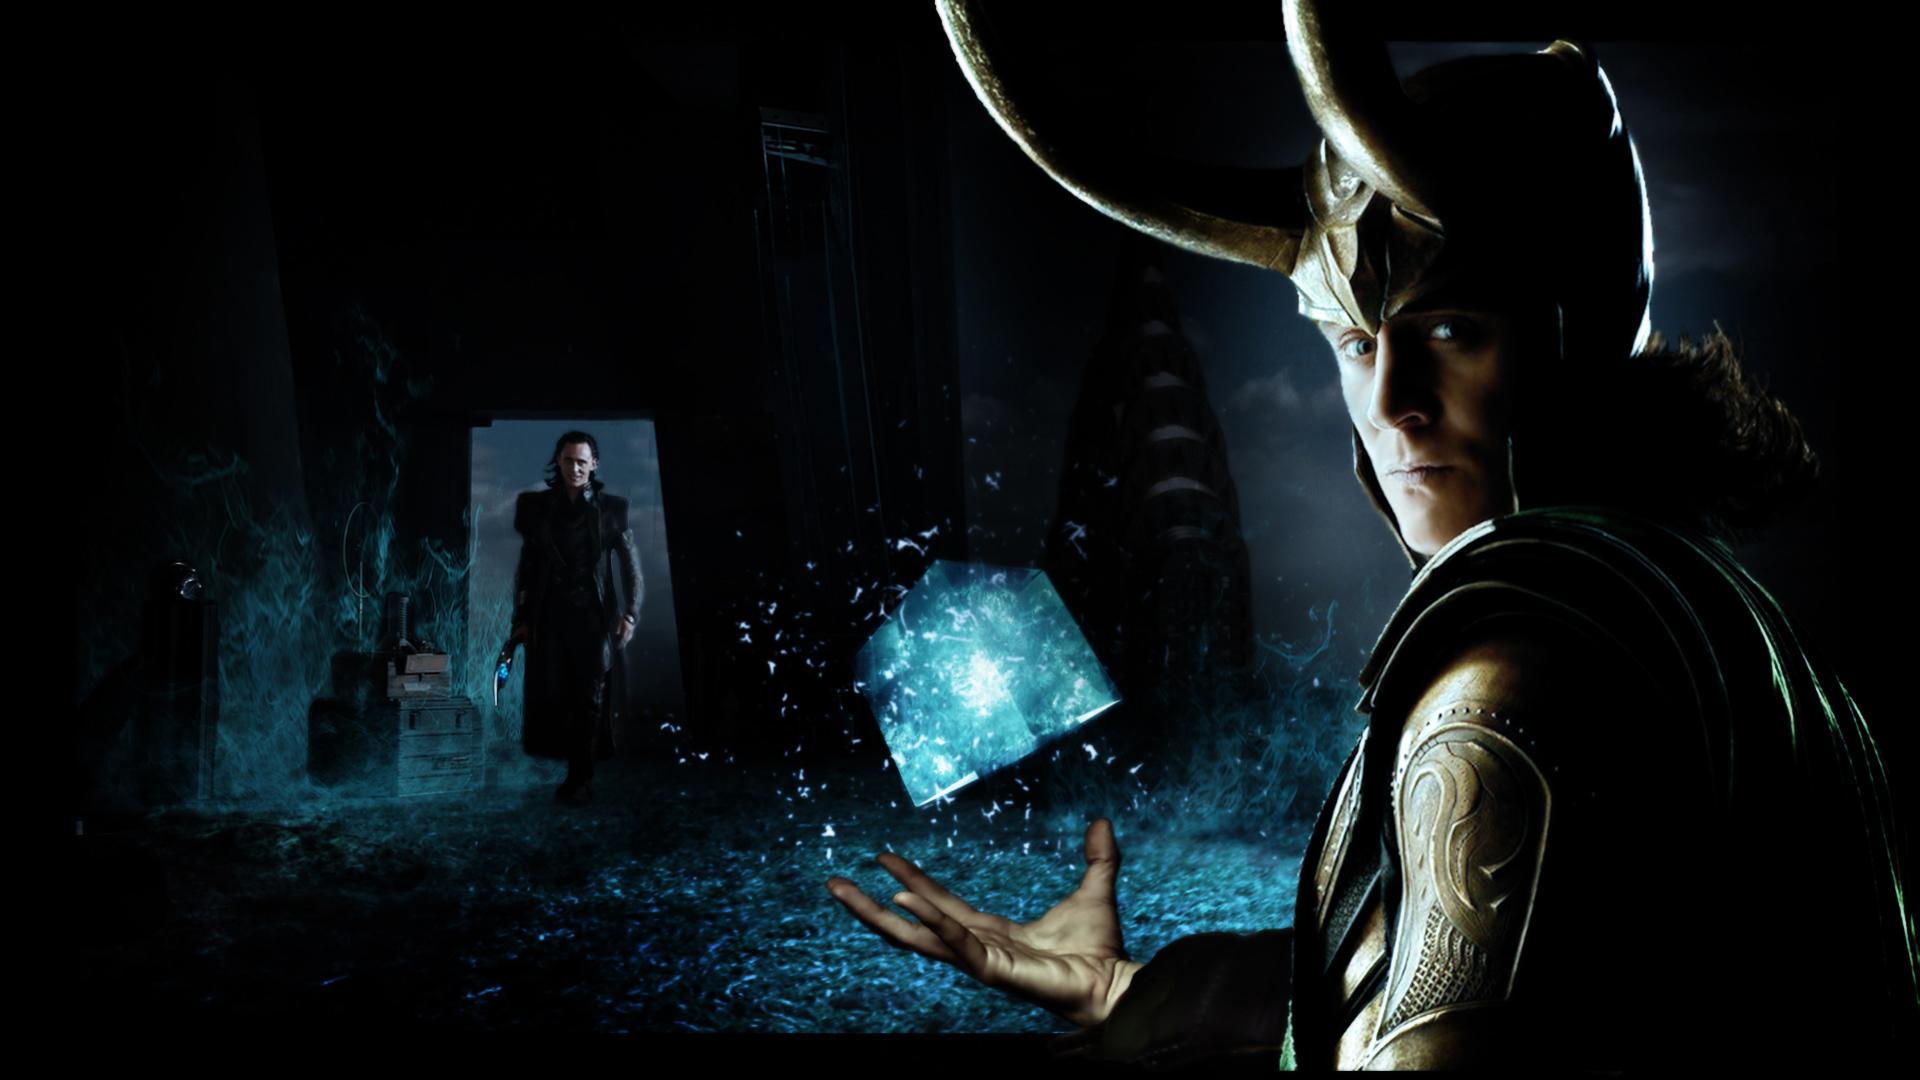 Download Loki Wallpaper Hd for Desktop